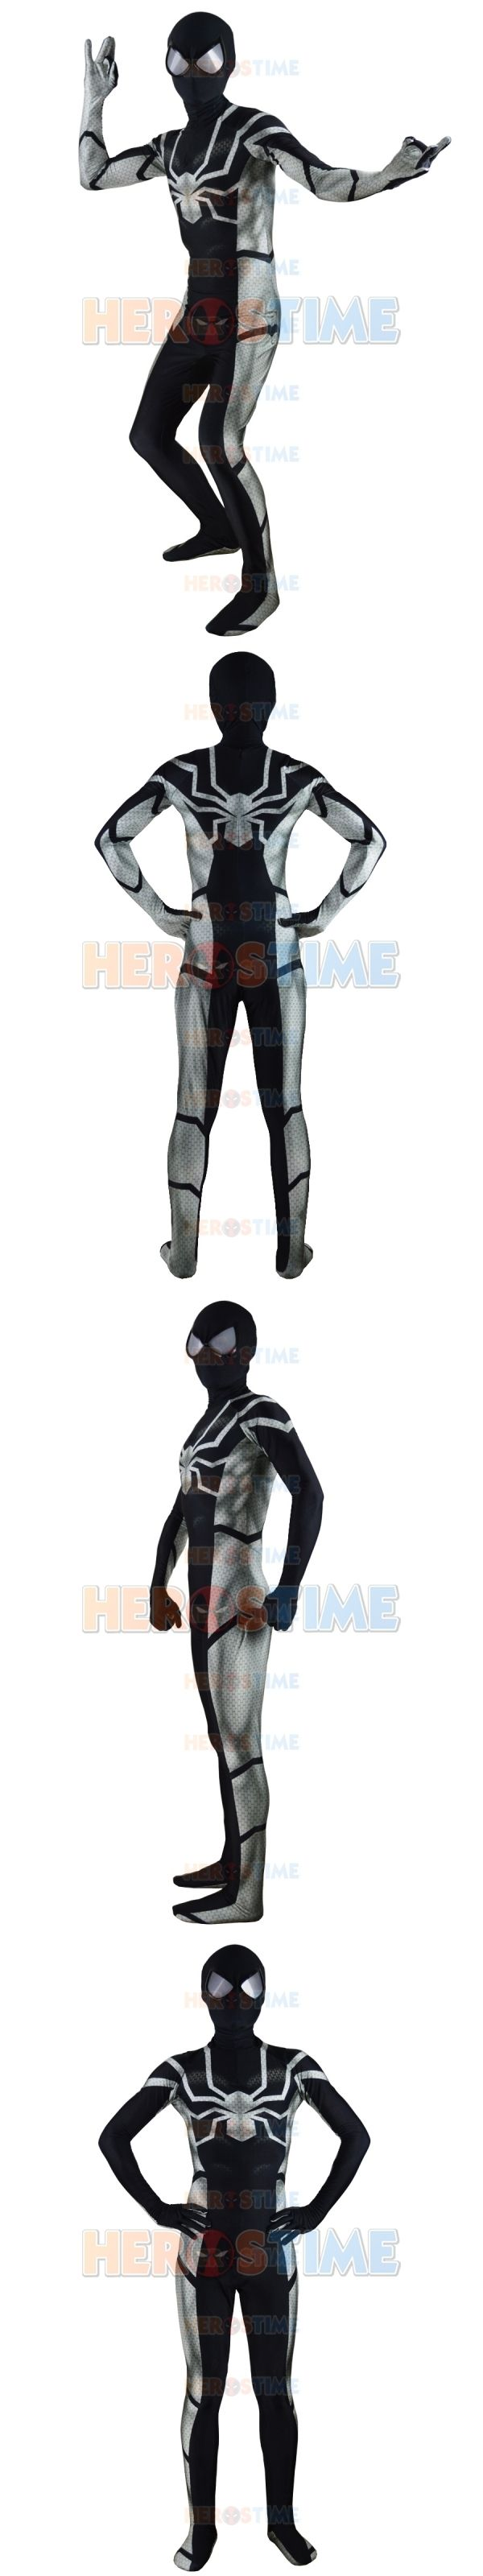 black spiderman costume 2015 Future  Spider-Man Costume Sealth Future Morph Suit Male superhero costume